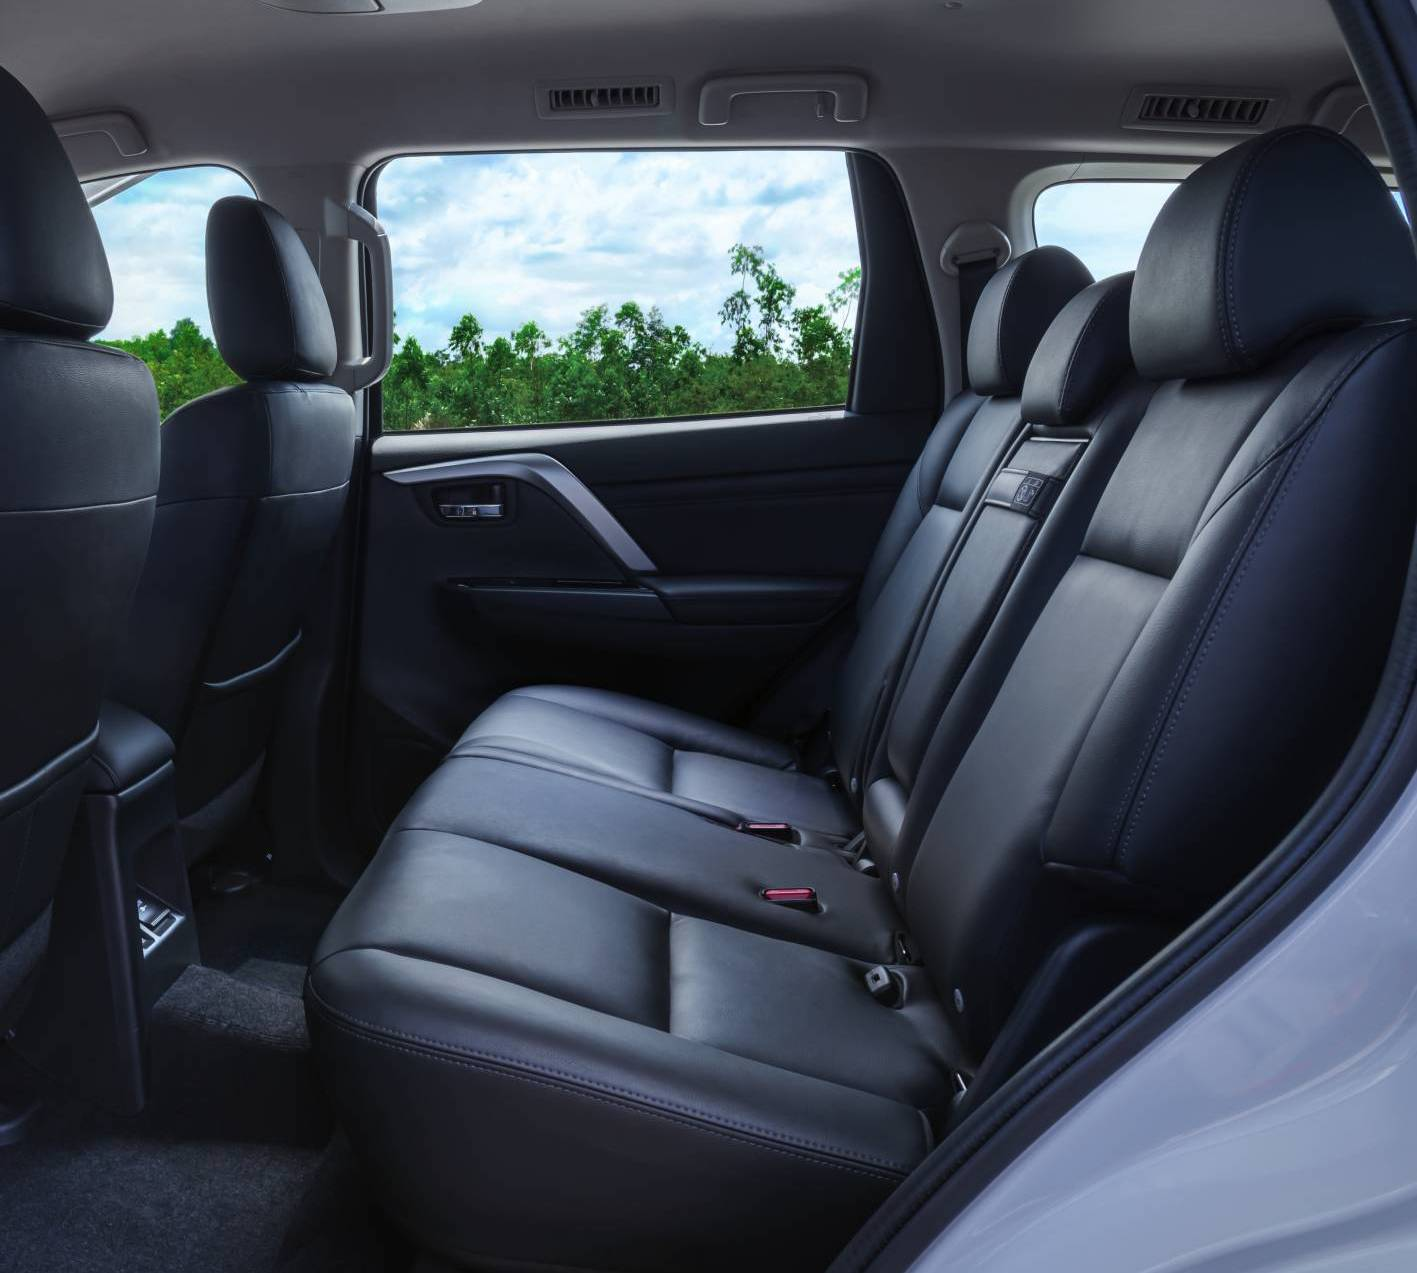 2020 Mitsubishi Pajero Sport Officially Revealed